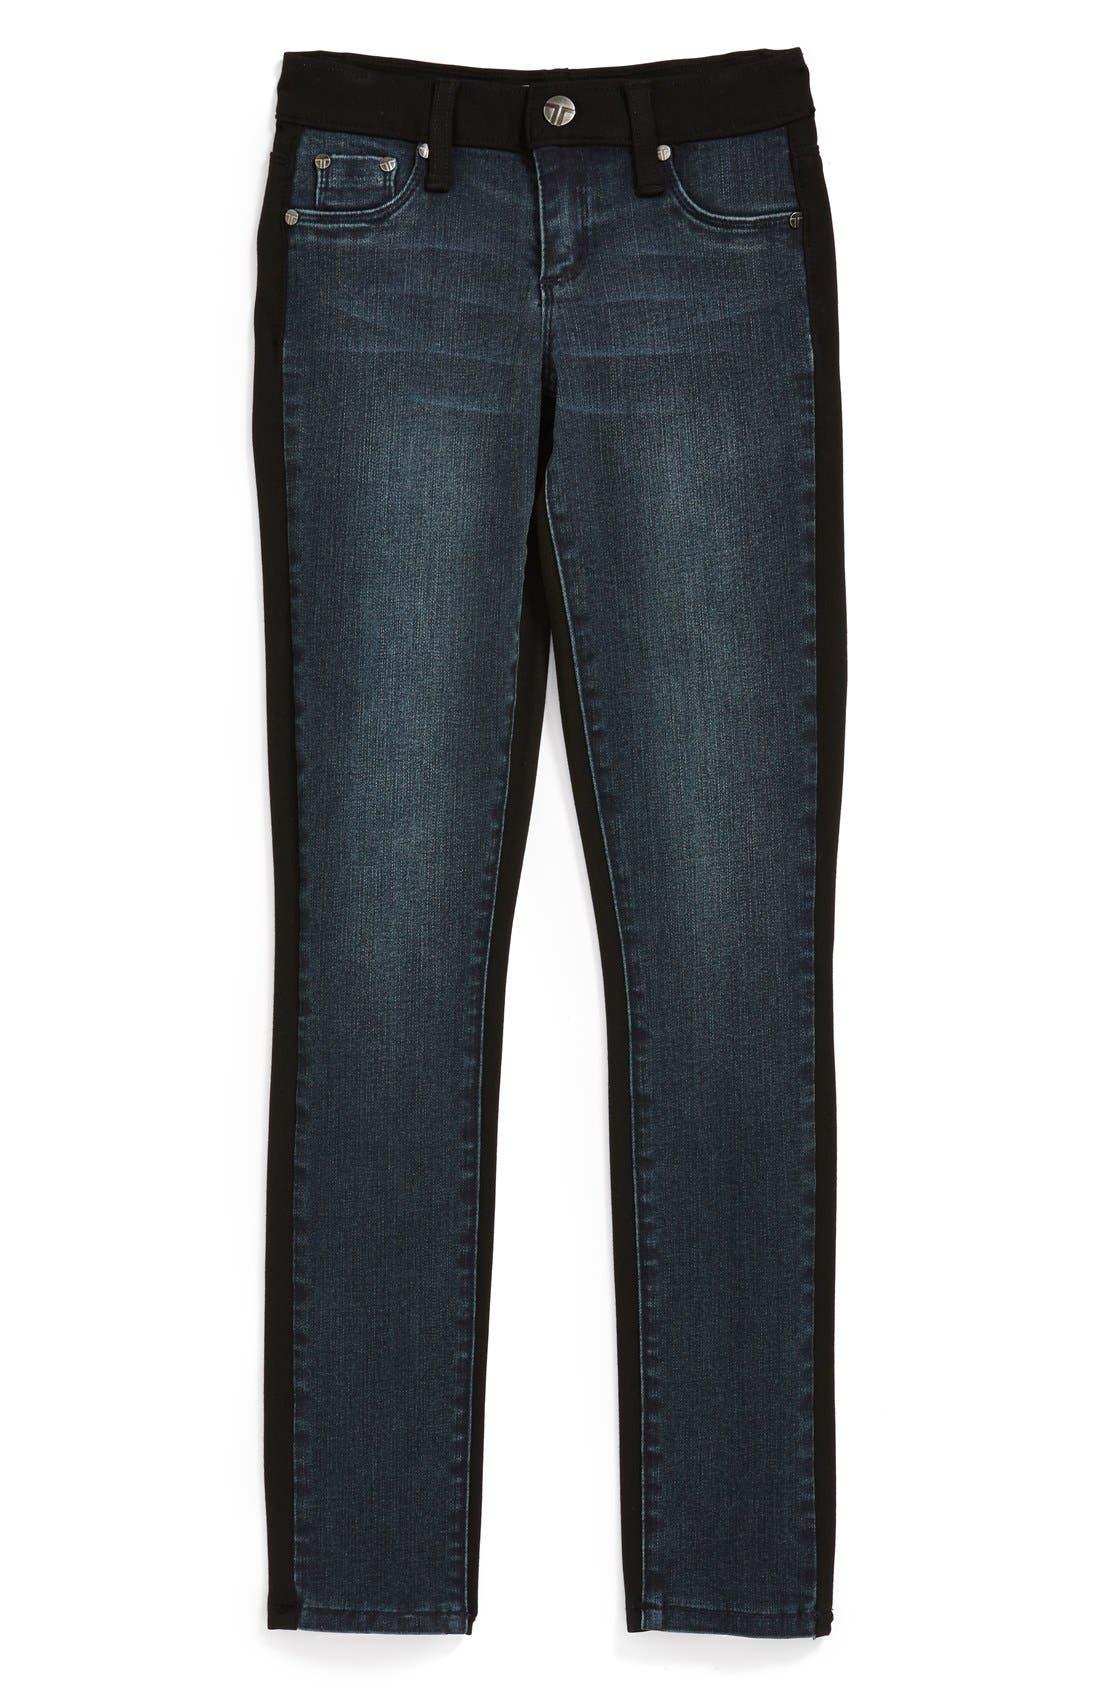 Main Image - Tractr Denim Front Knit Back Pants (Big Girls)